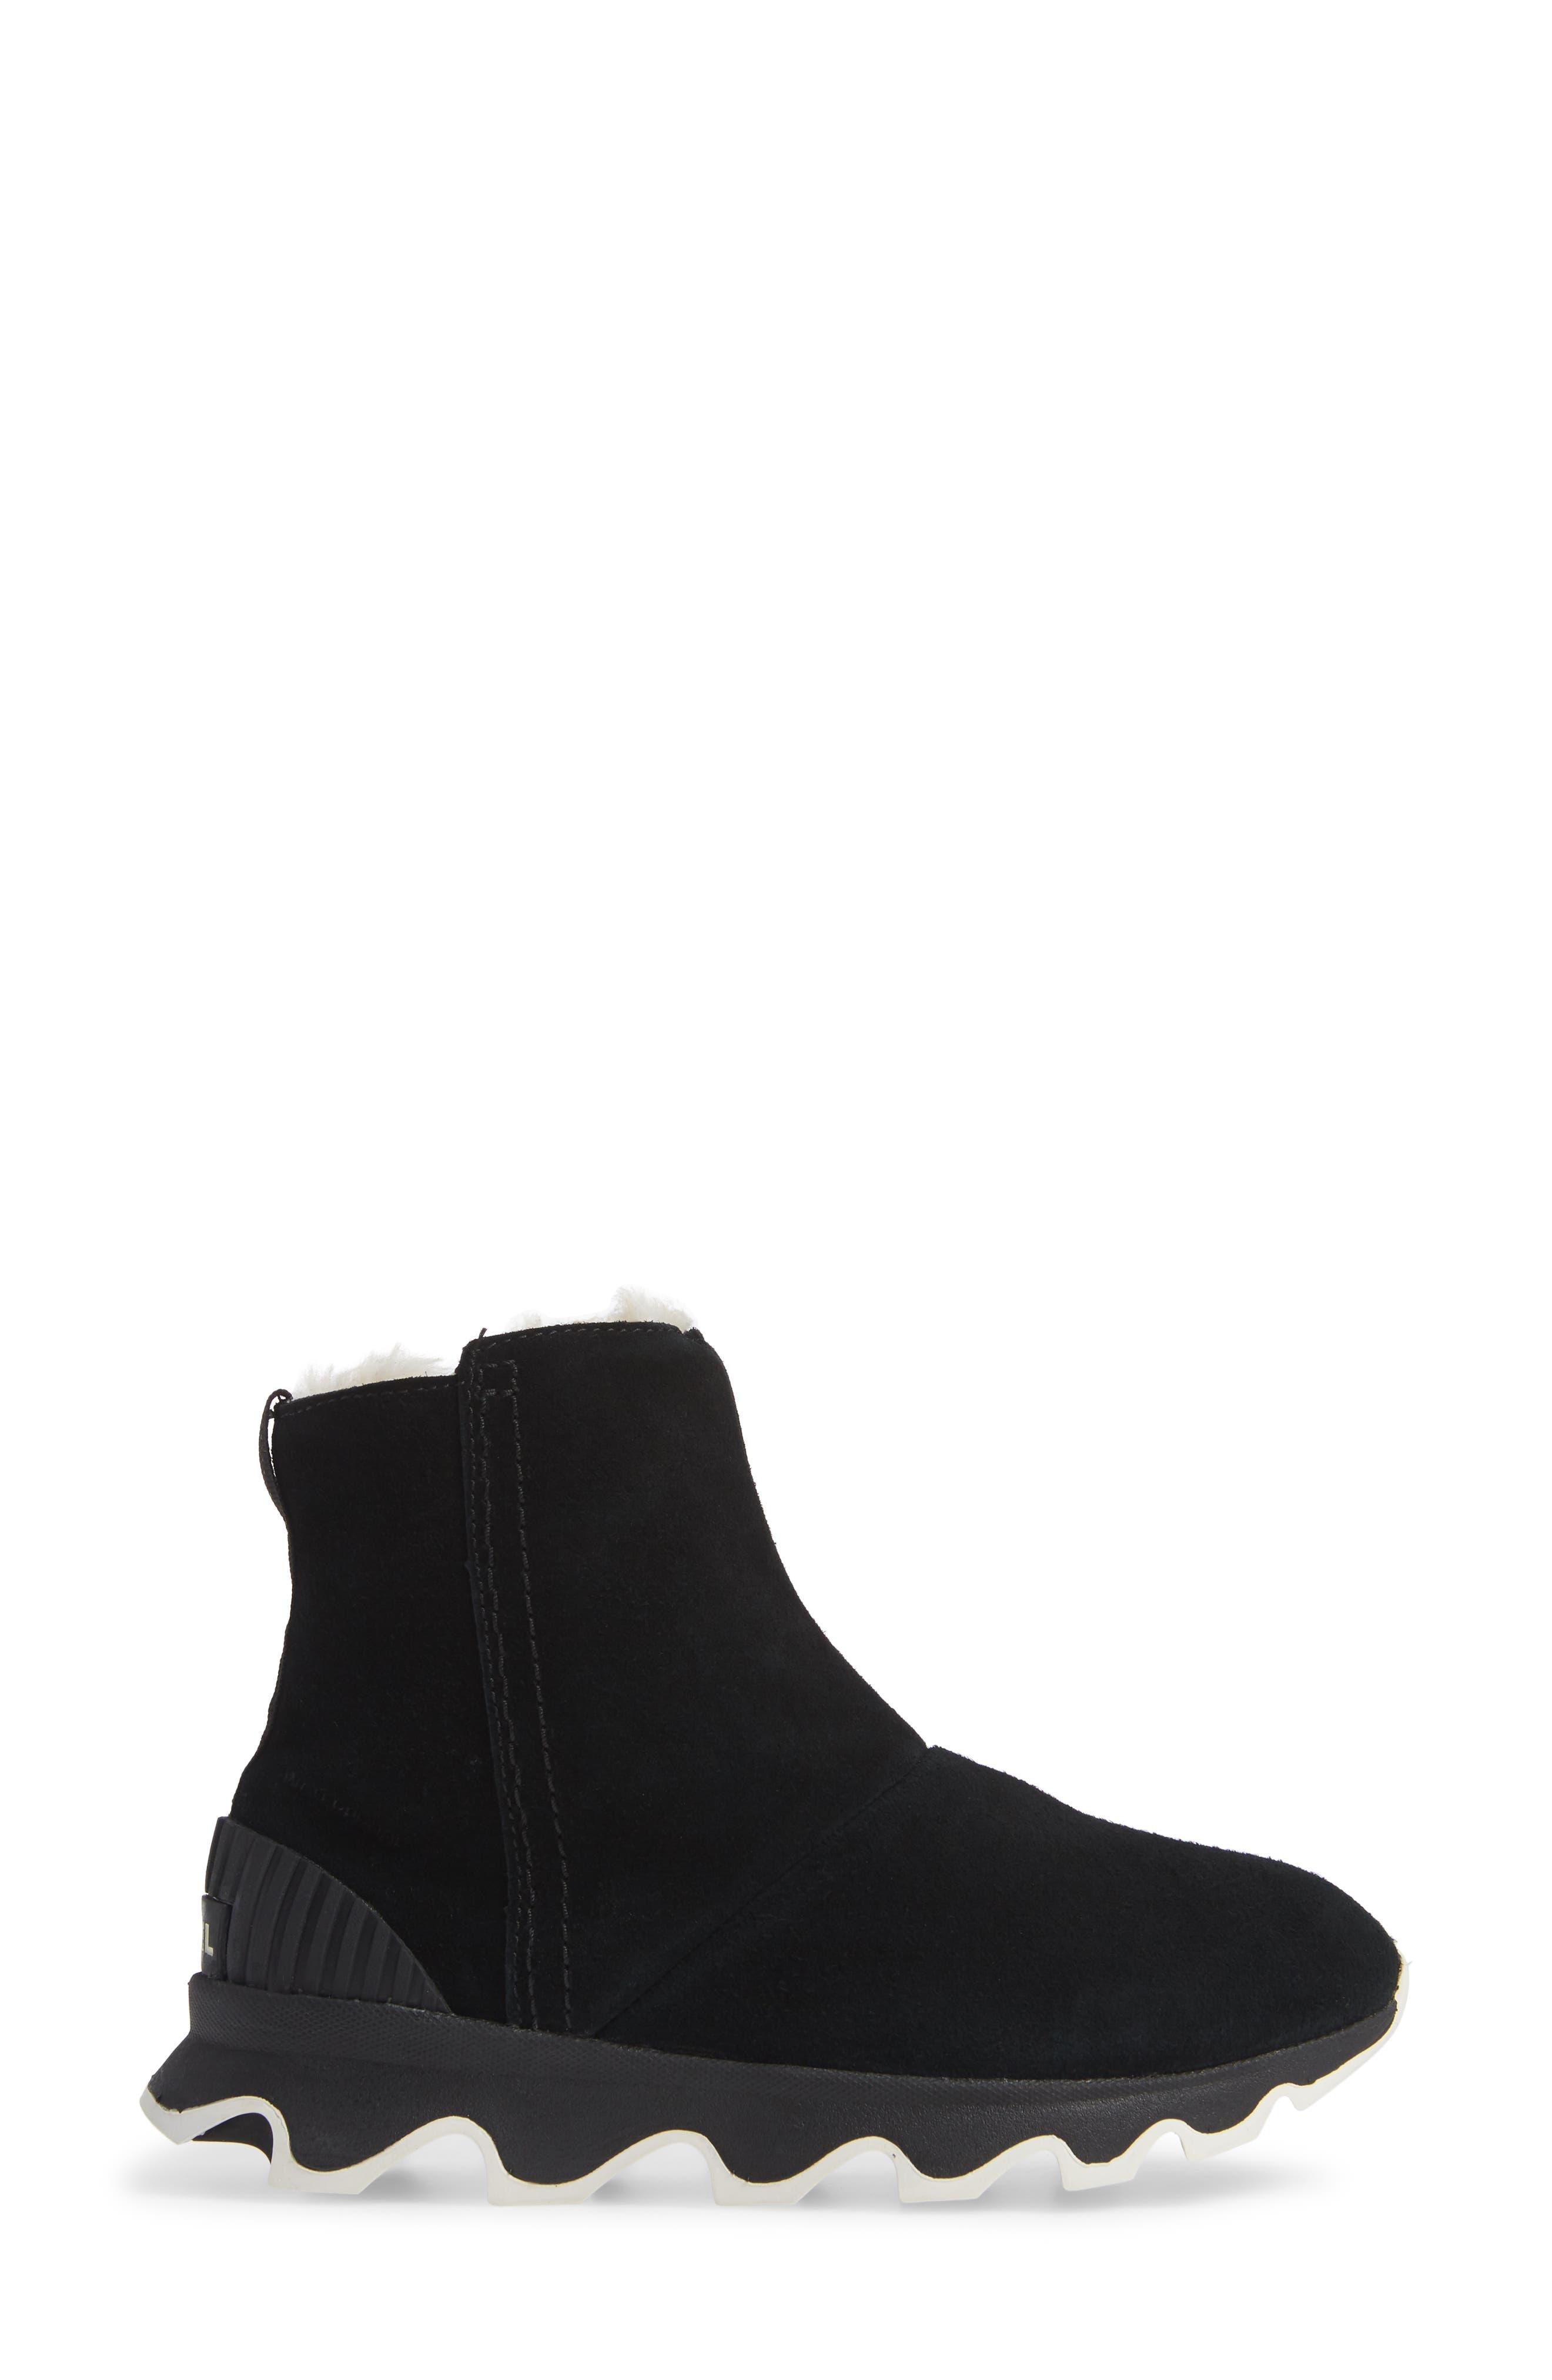 Kinetic Insulated Waterproof Short Boots,                             Alternate thumbnail 3, color,                             BLACK/ SEA SALT